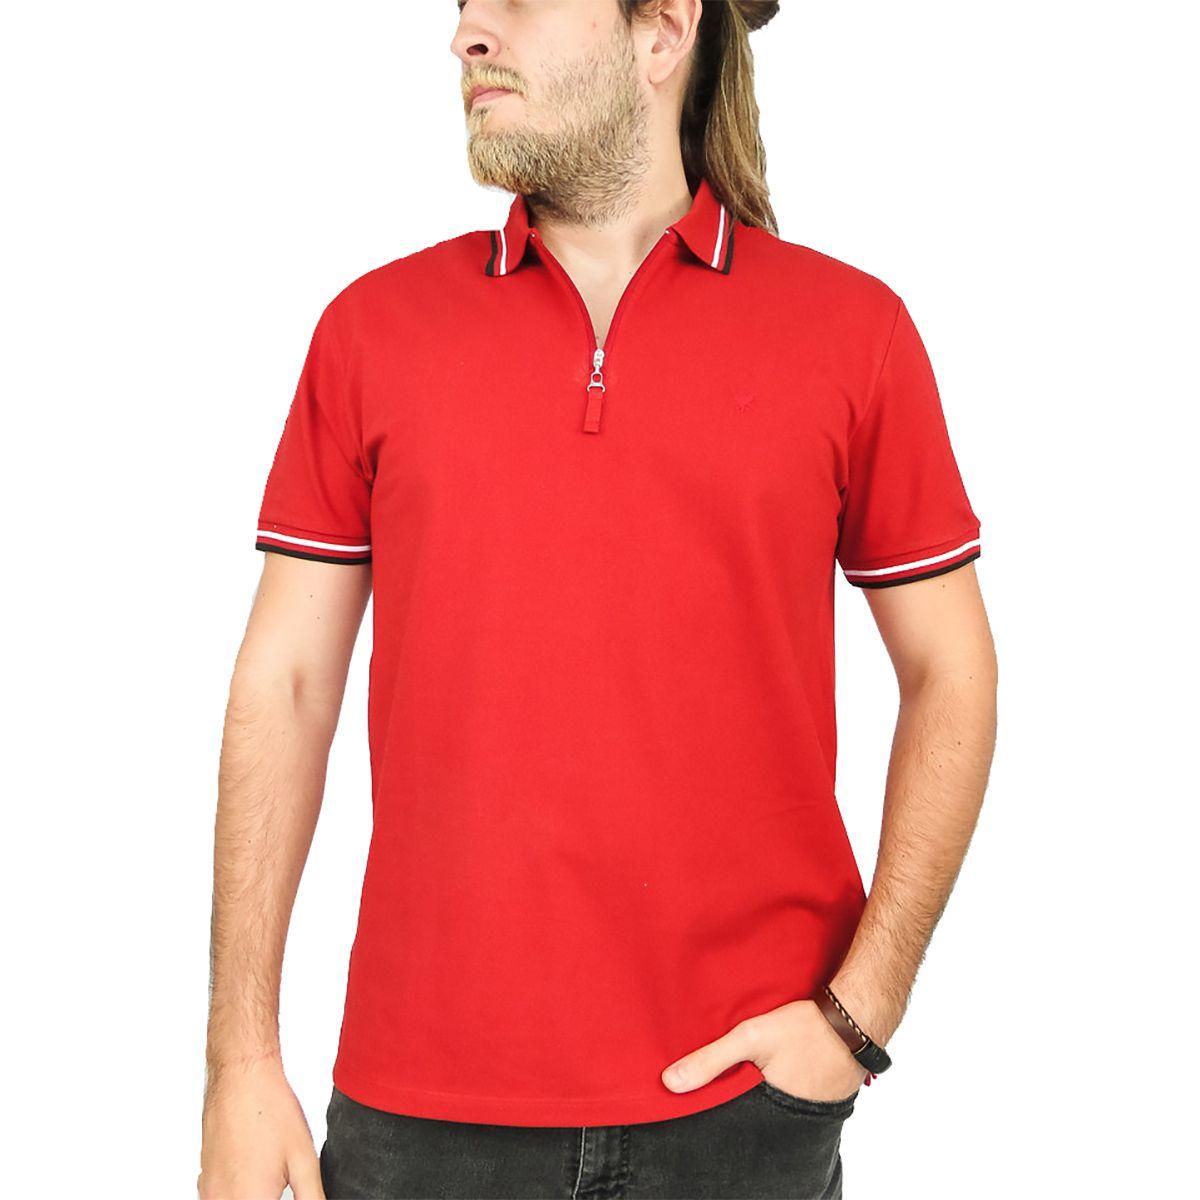 Camiseta Cavalera Masculina Gola Polo Ziper